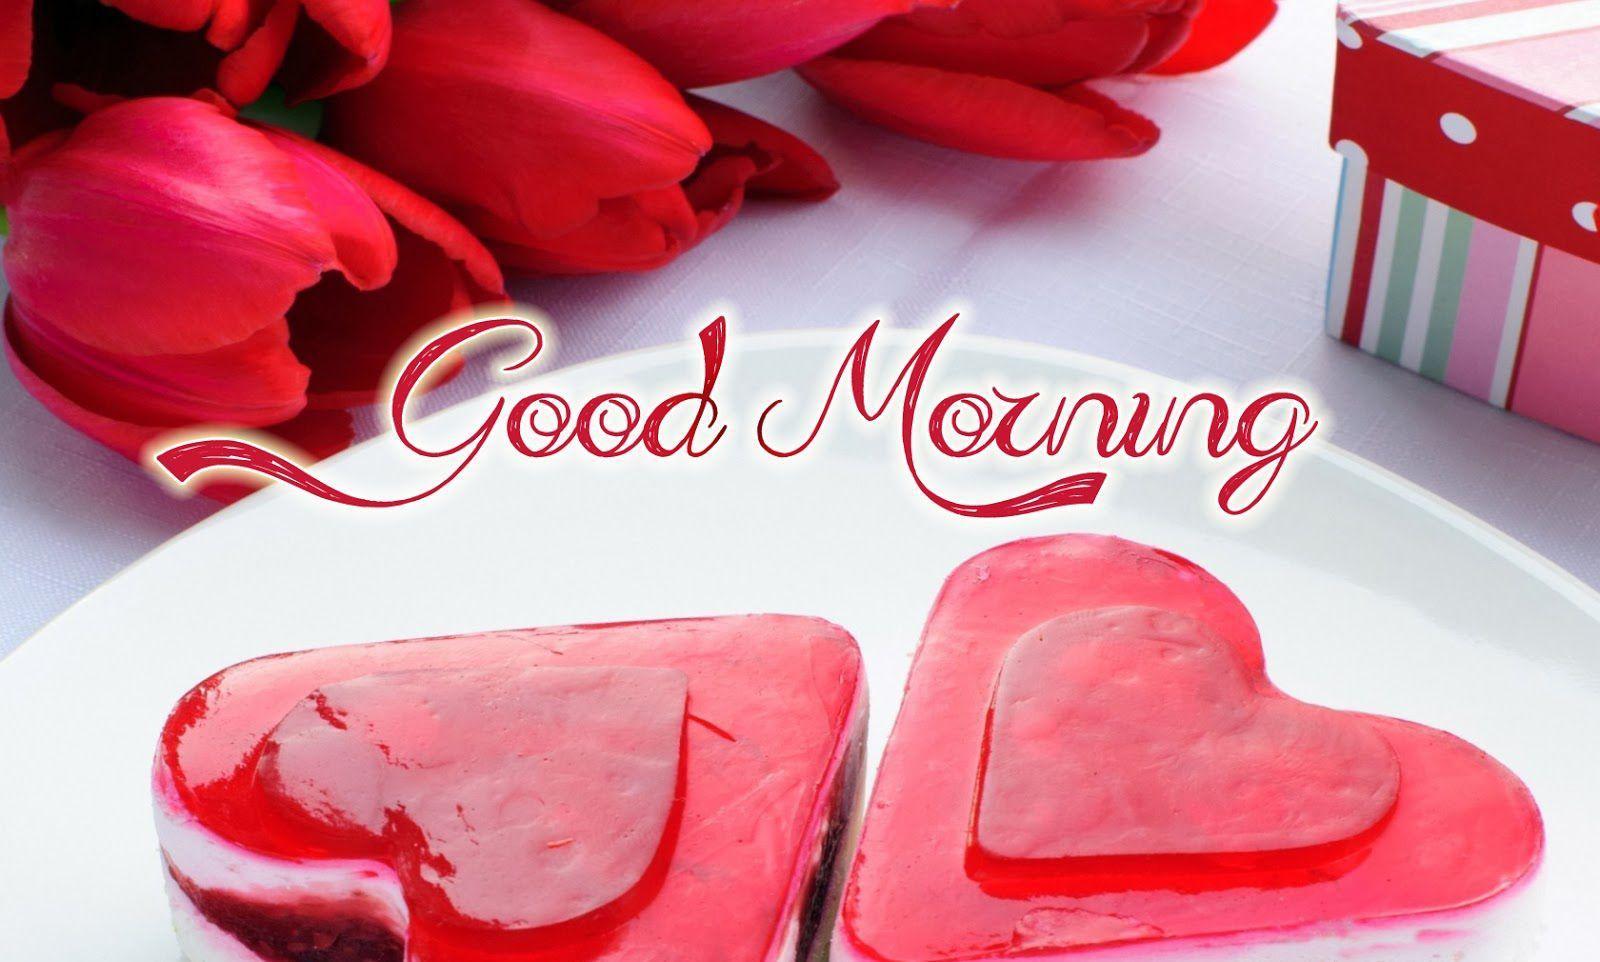 Love Good Morning Wallpapers Wallpaper Cave